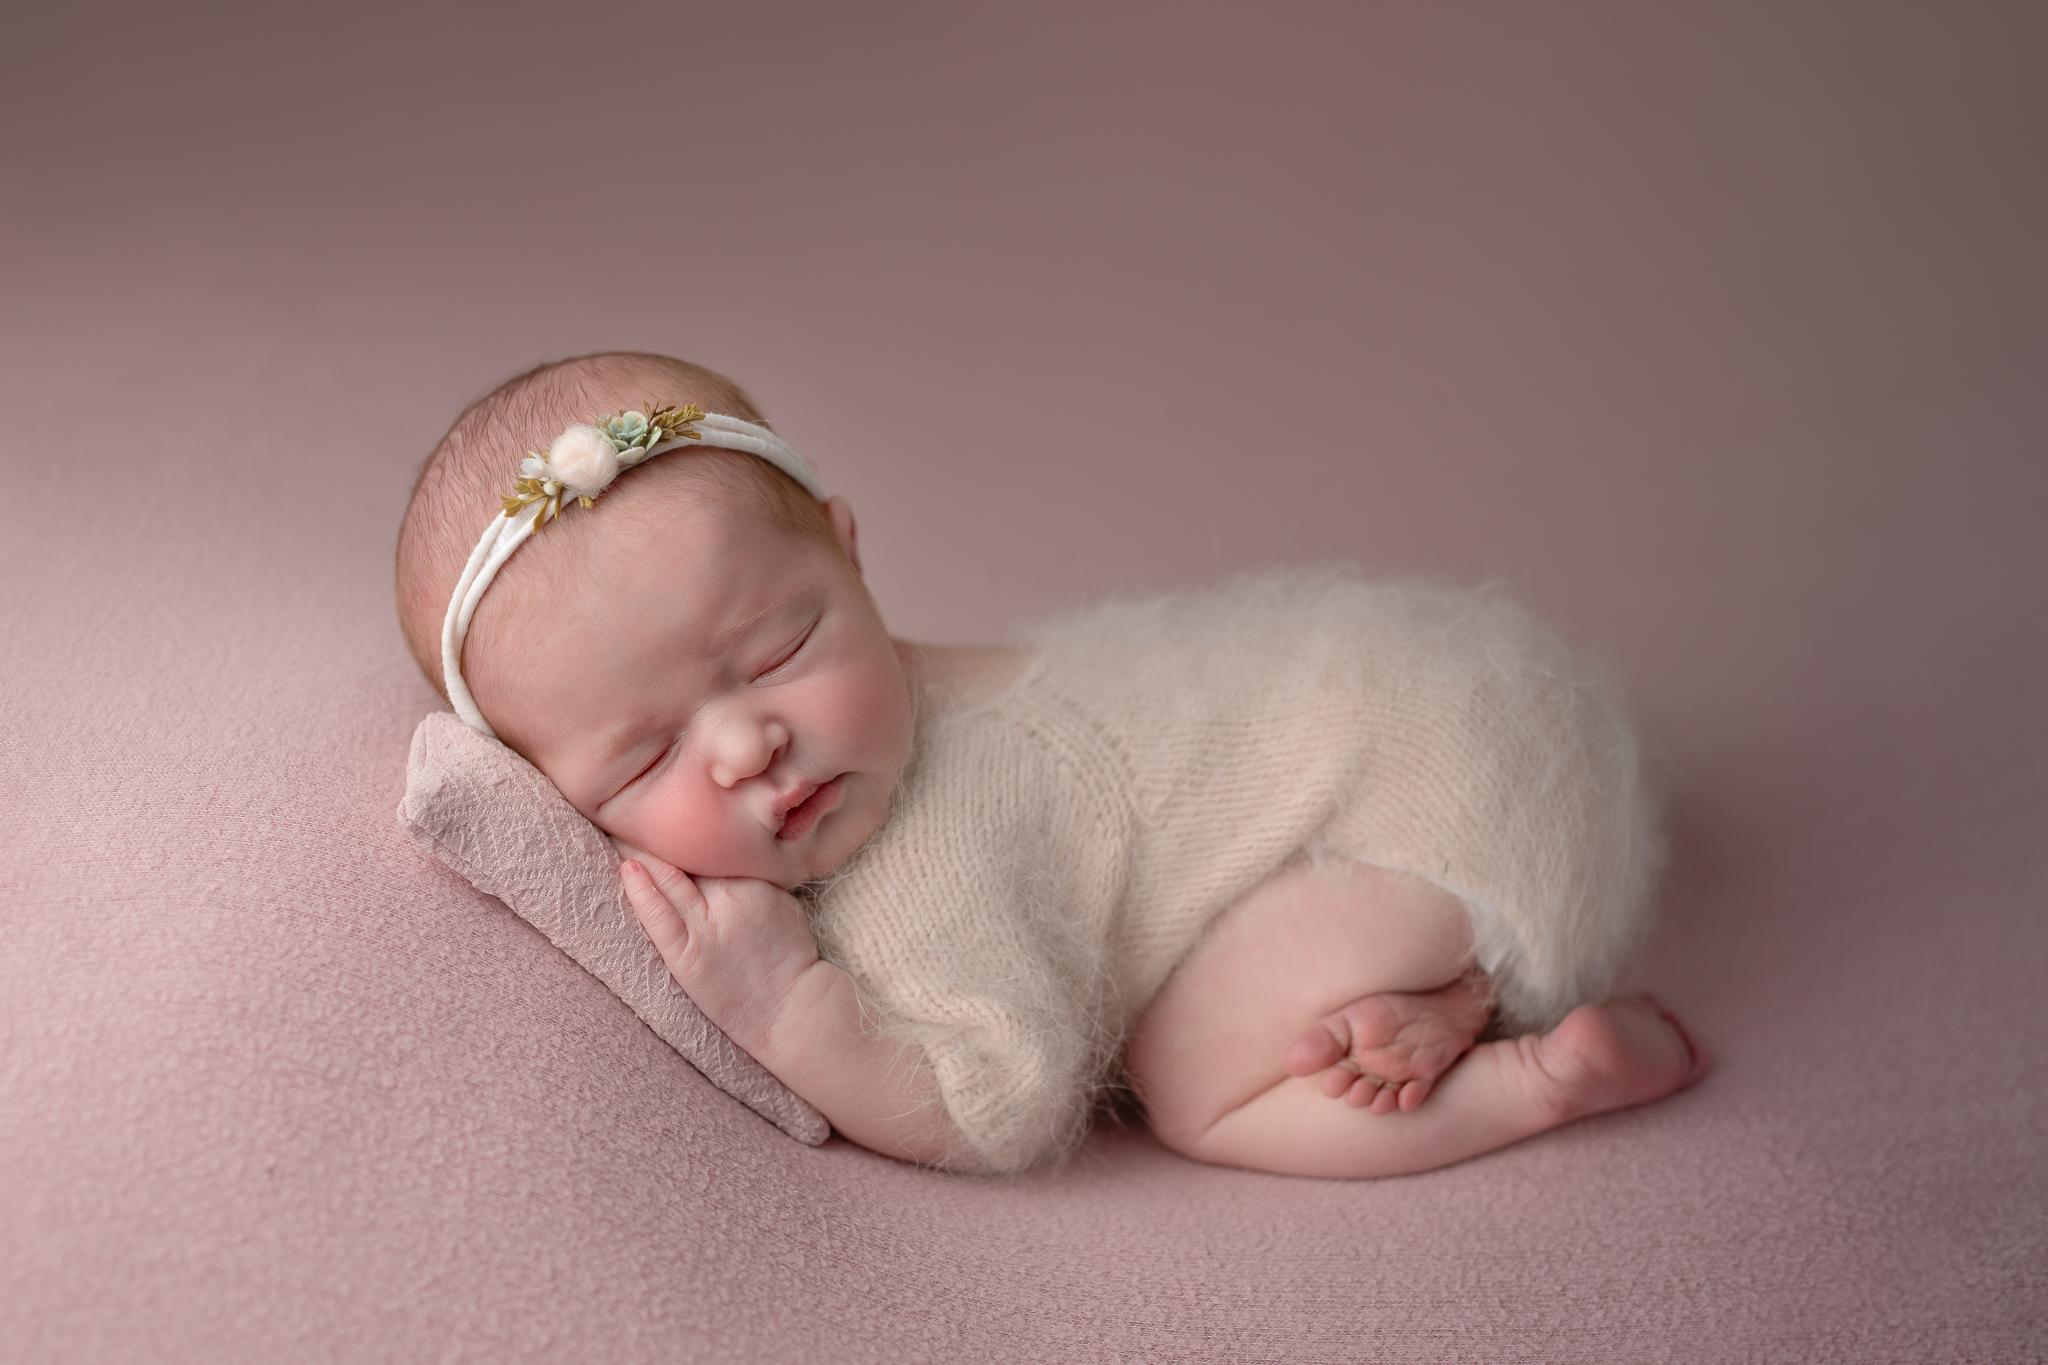 Newborn541NaomiLuciennePhotography032019-Edit.jpg